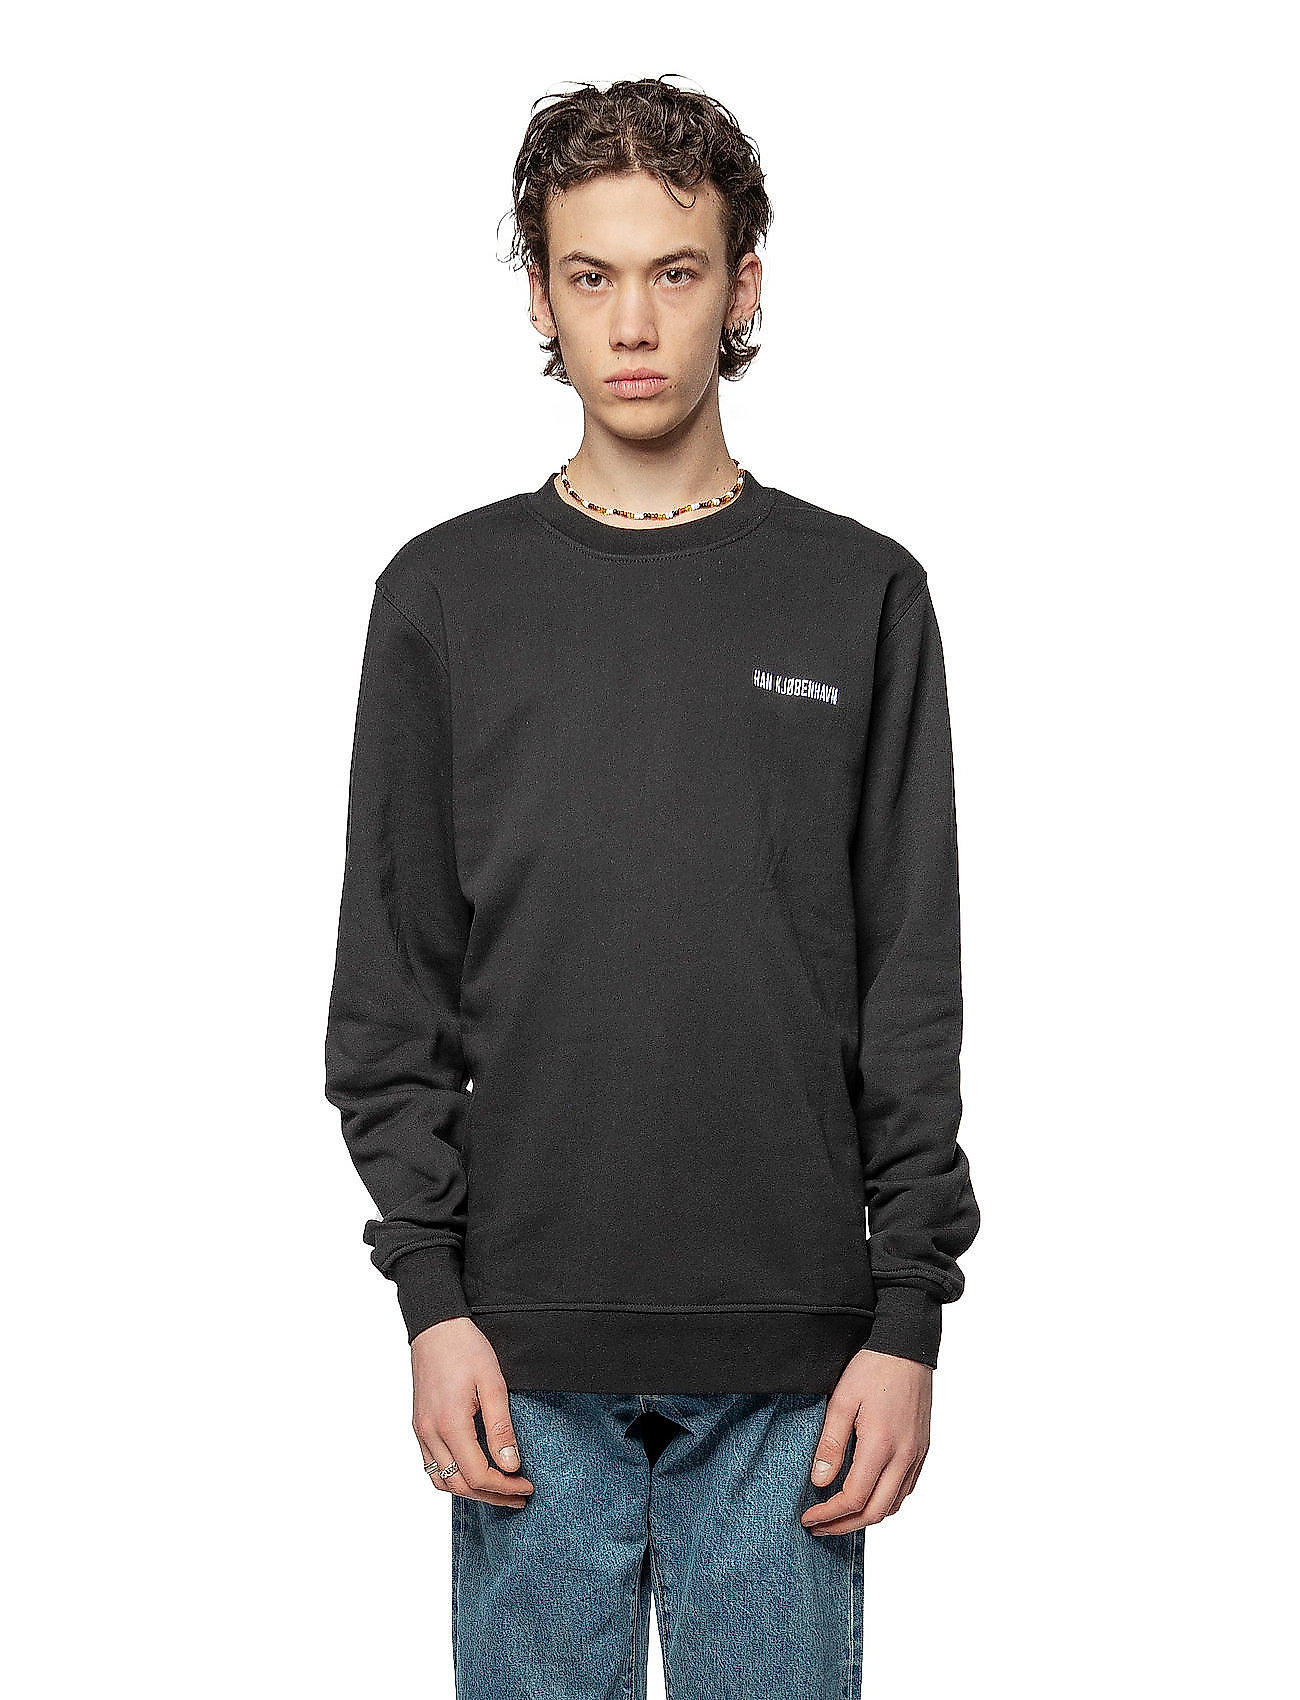 HAN Kjøbenhavn - Casual Crew - basic sweatshirts - black - 0